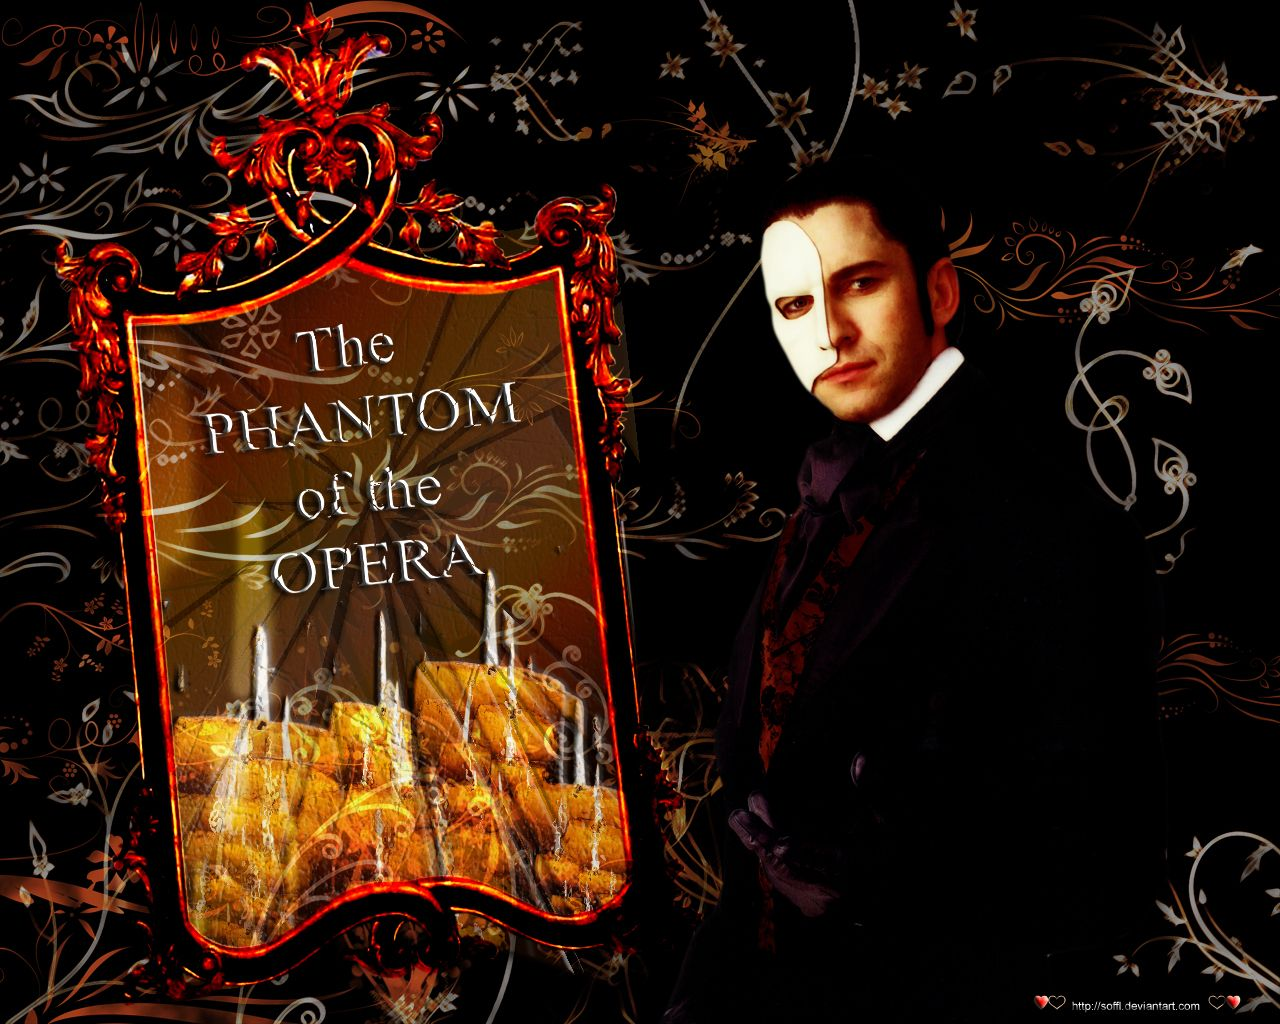 Phantom Of The Opera Wallpapers Top Free Phantom Of The Opera Backgrounds Wallpaperaccess